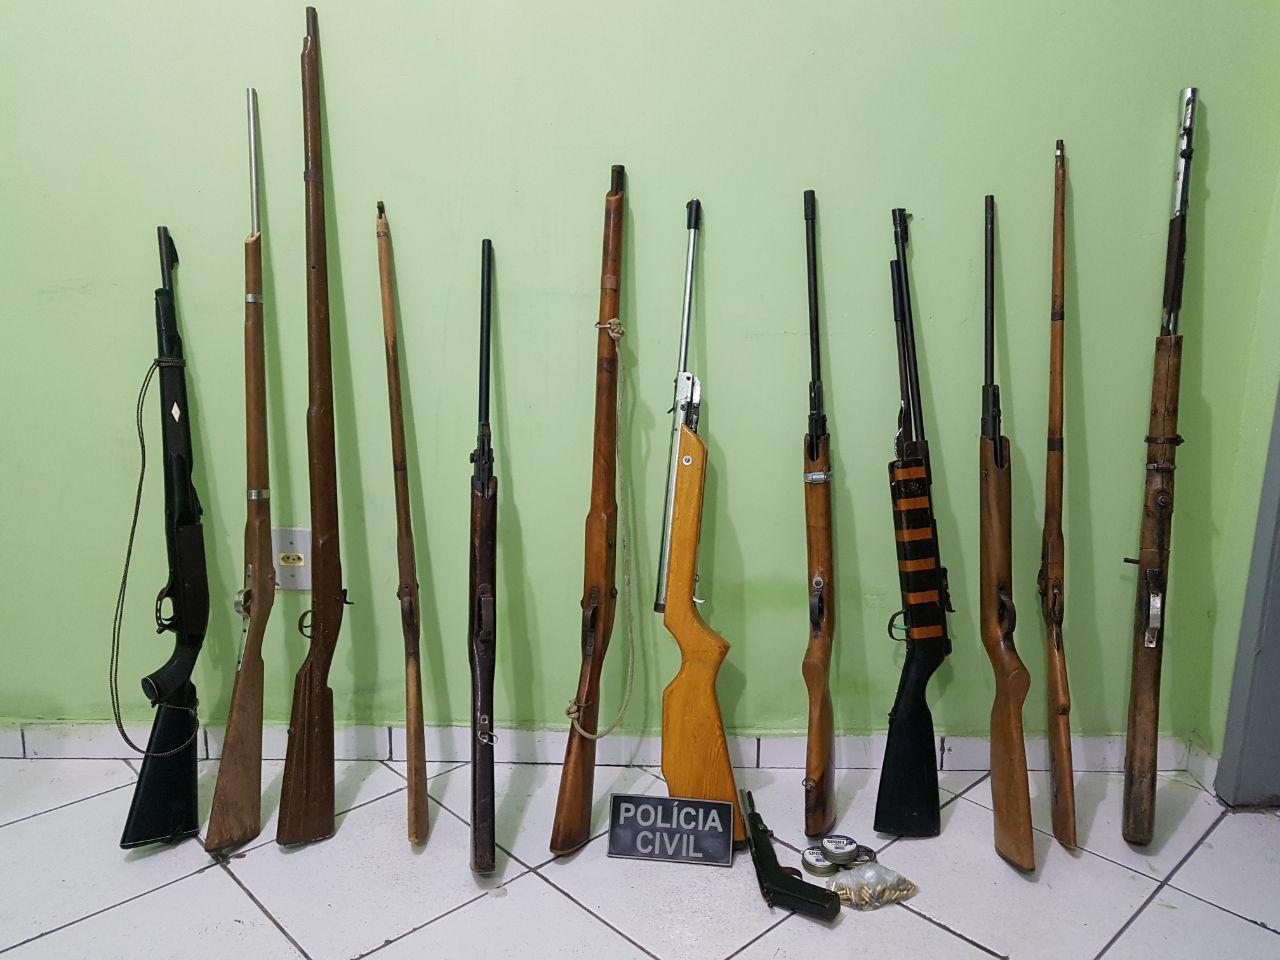 Pol cia desmancha oficina clandestina de armas em pio ix for Oficina armas lanzarote